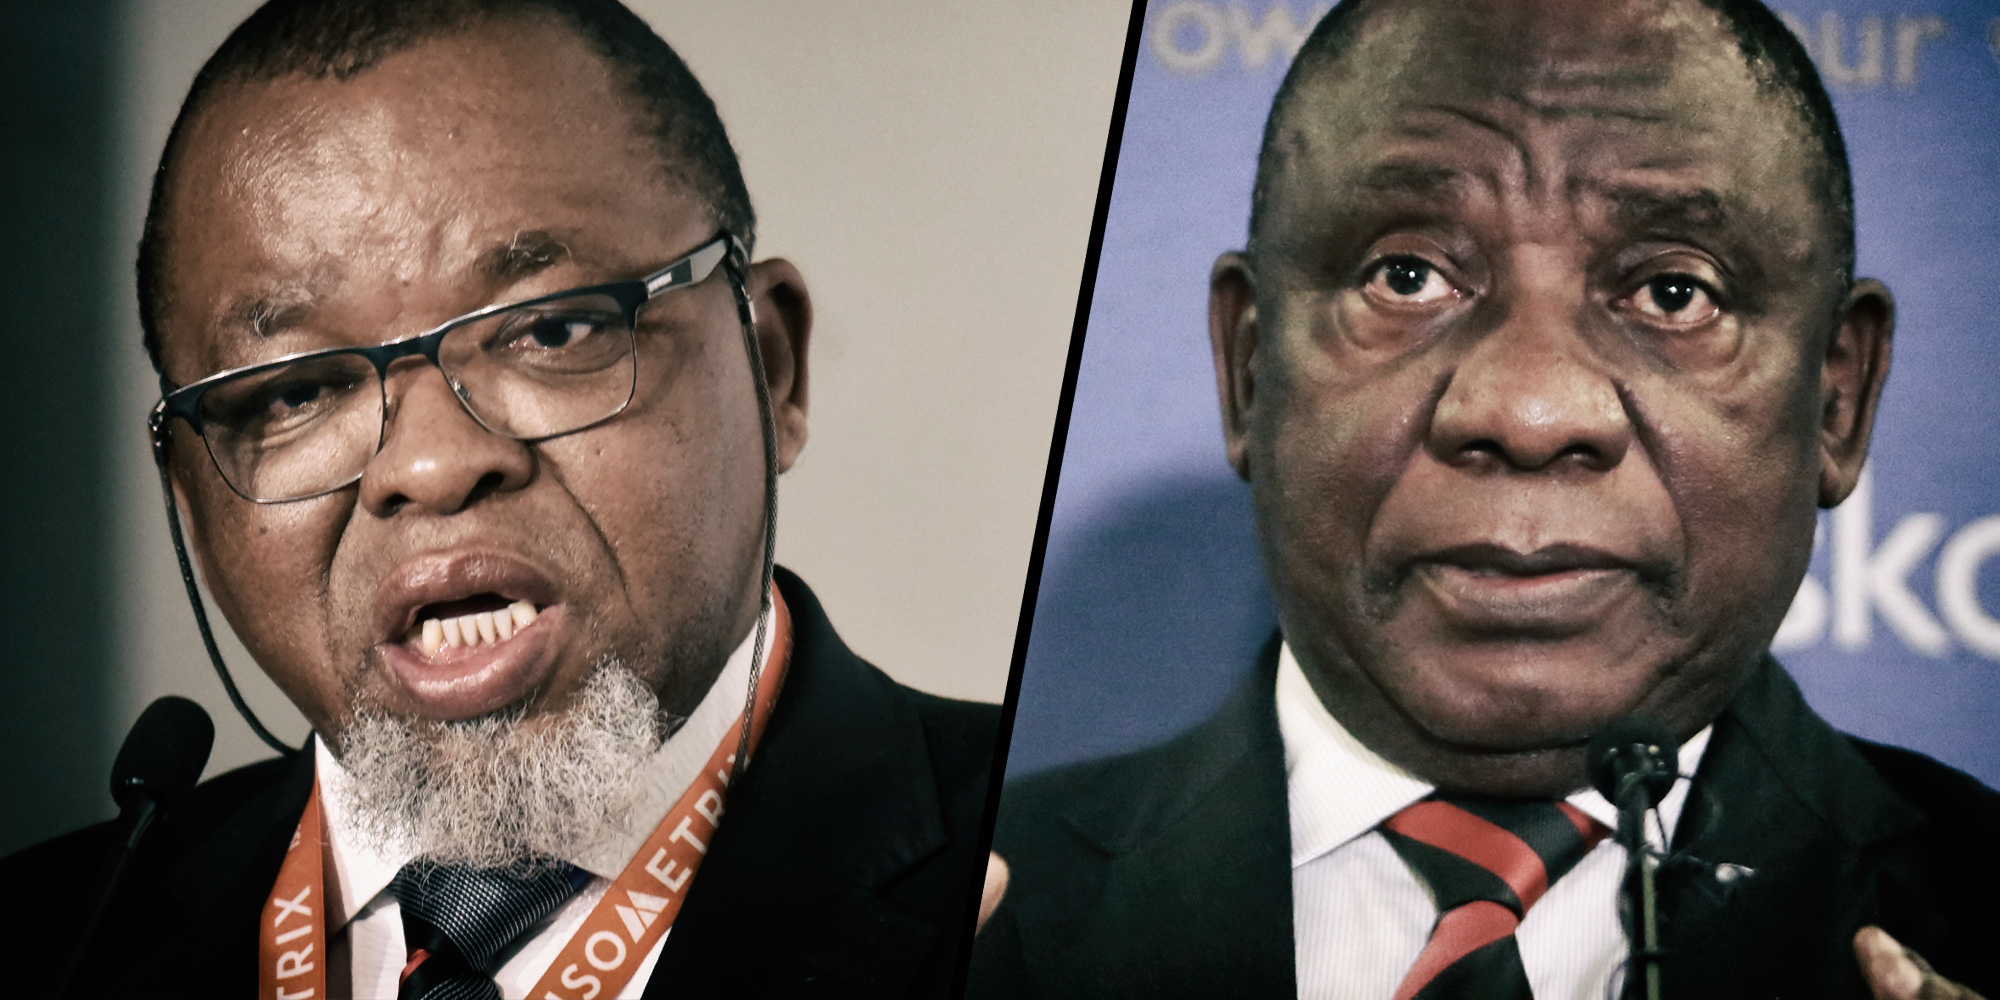 Glimmer of light: Mining sector welcomes President Ramaphosa's major move on energy - Daily Maverick